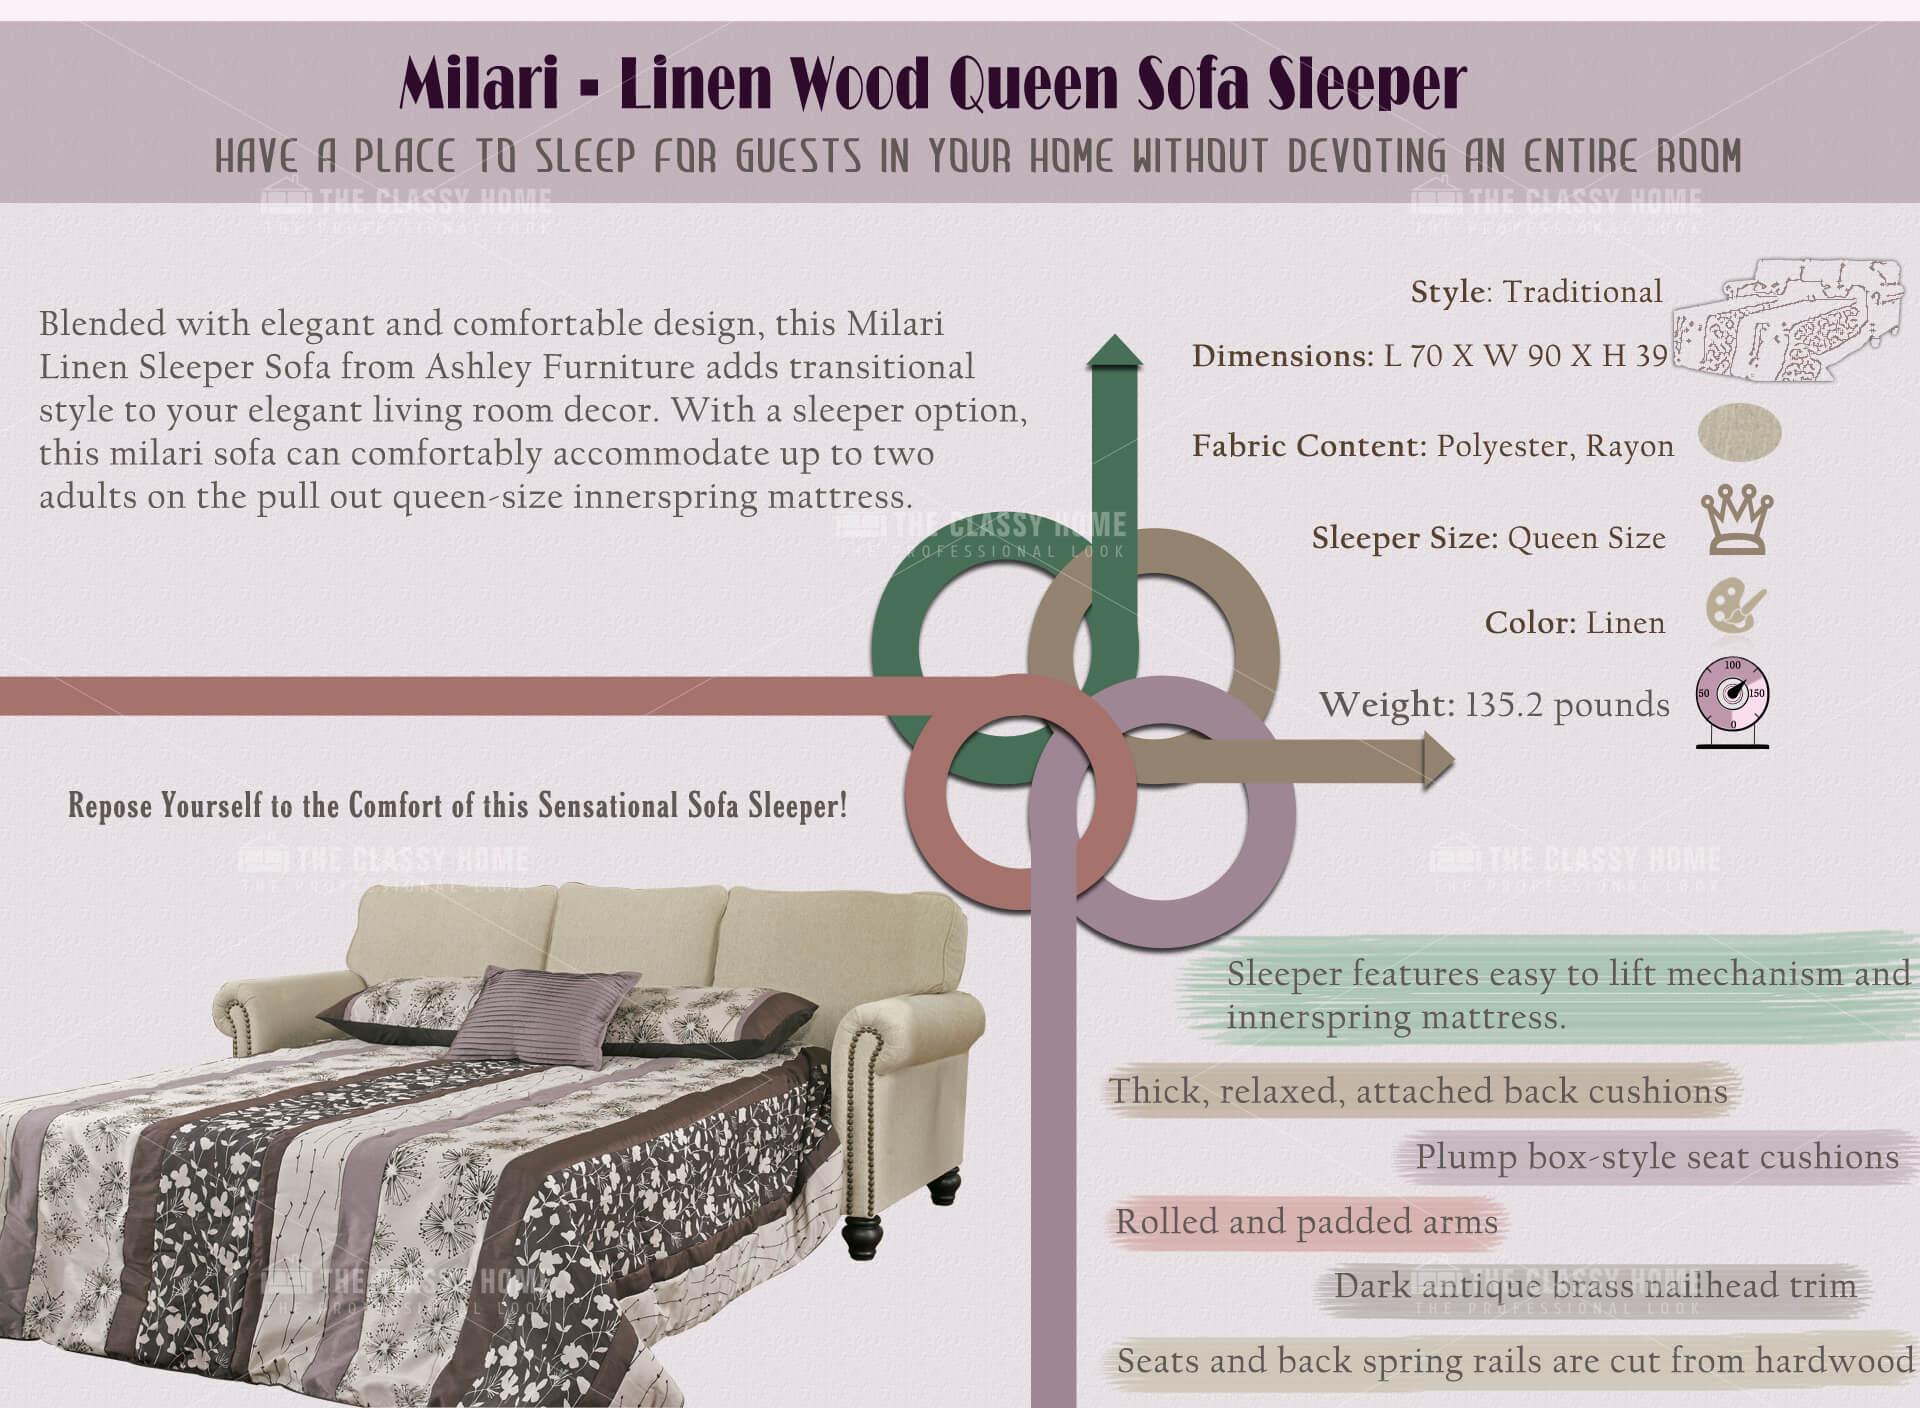 Ashley Furniture Milari Queen Sofa Sleeper